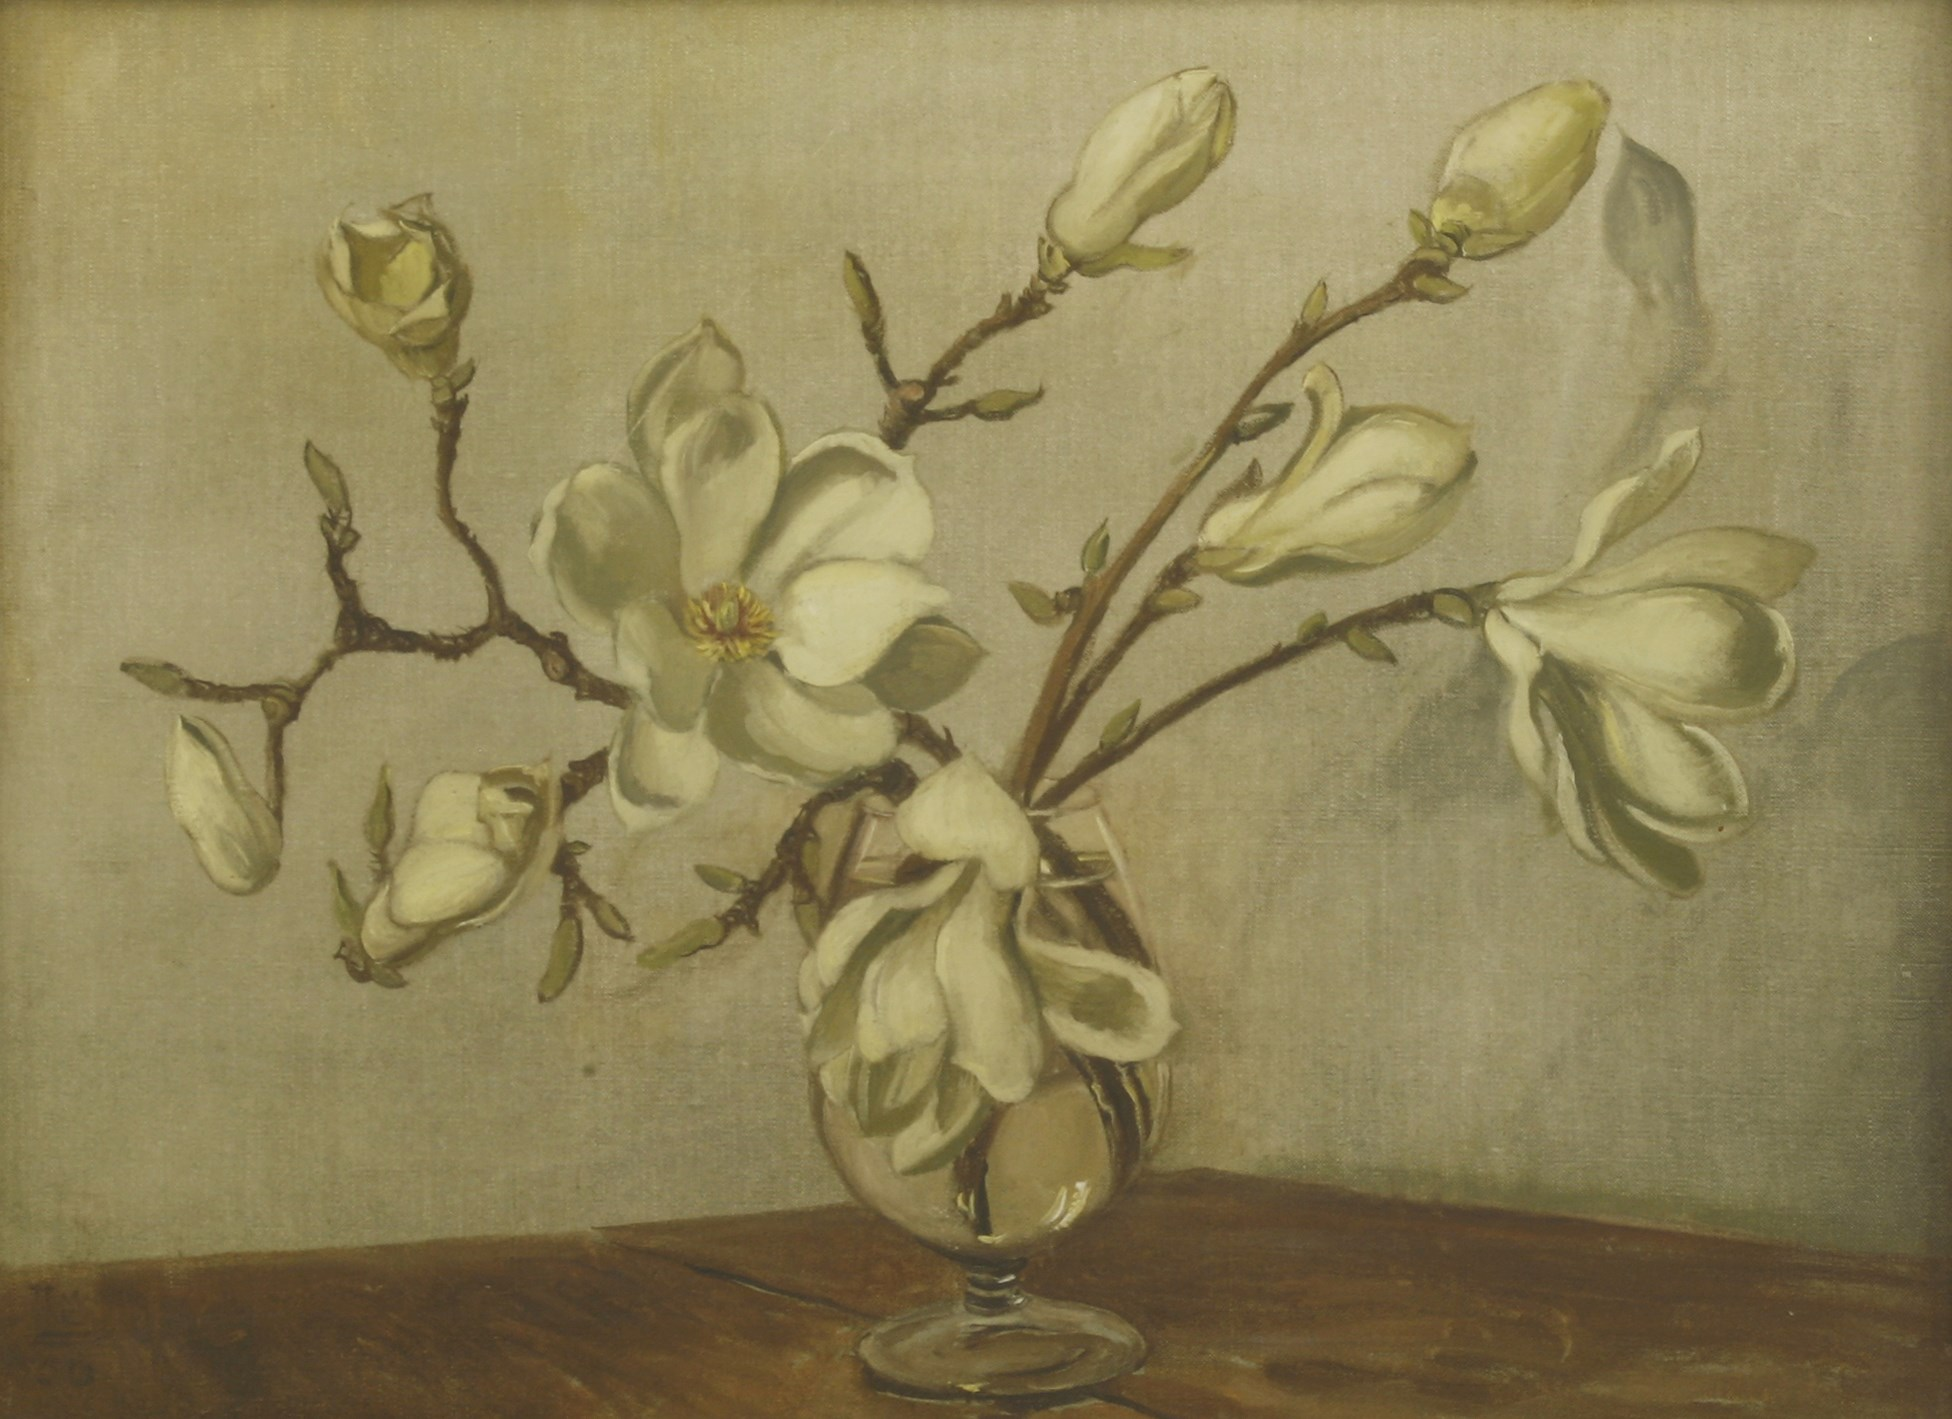 Lot 35 Modern British School Magnolia Blossom In A